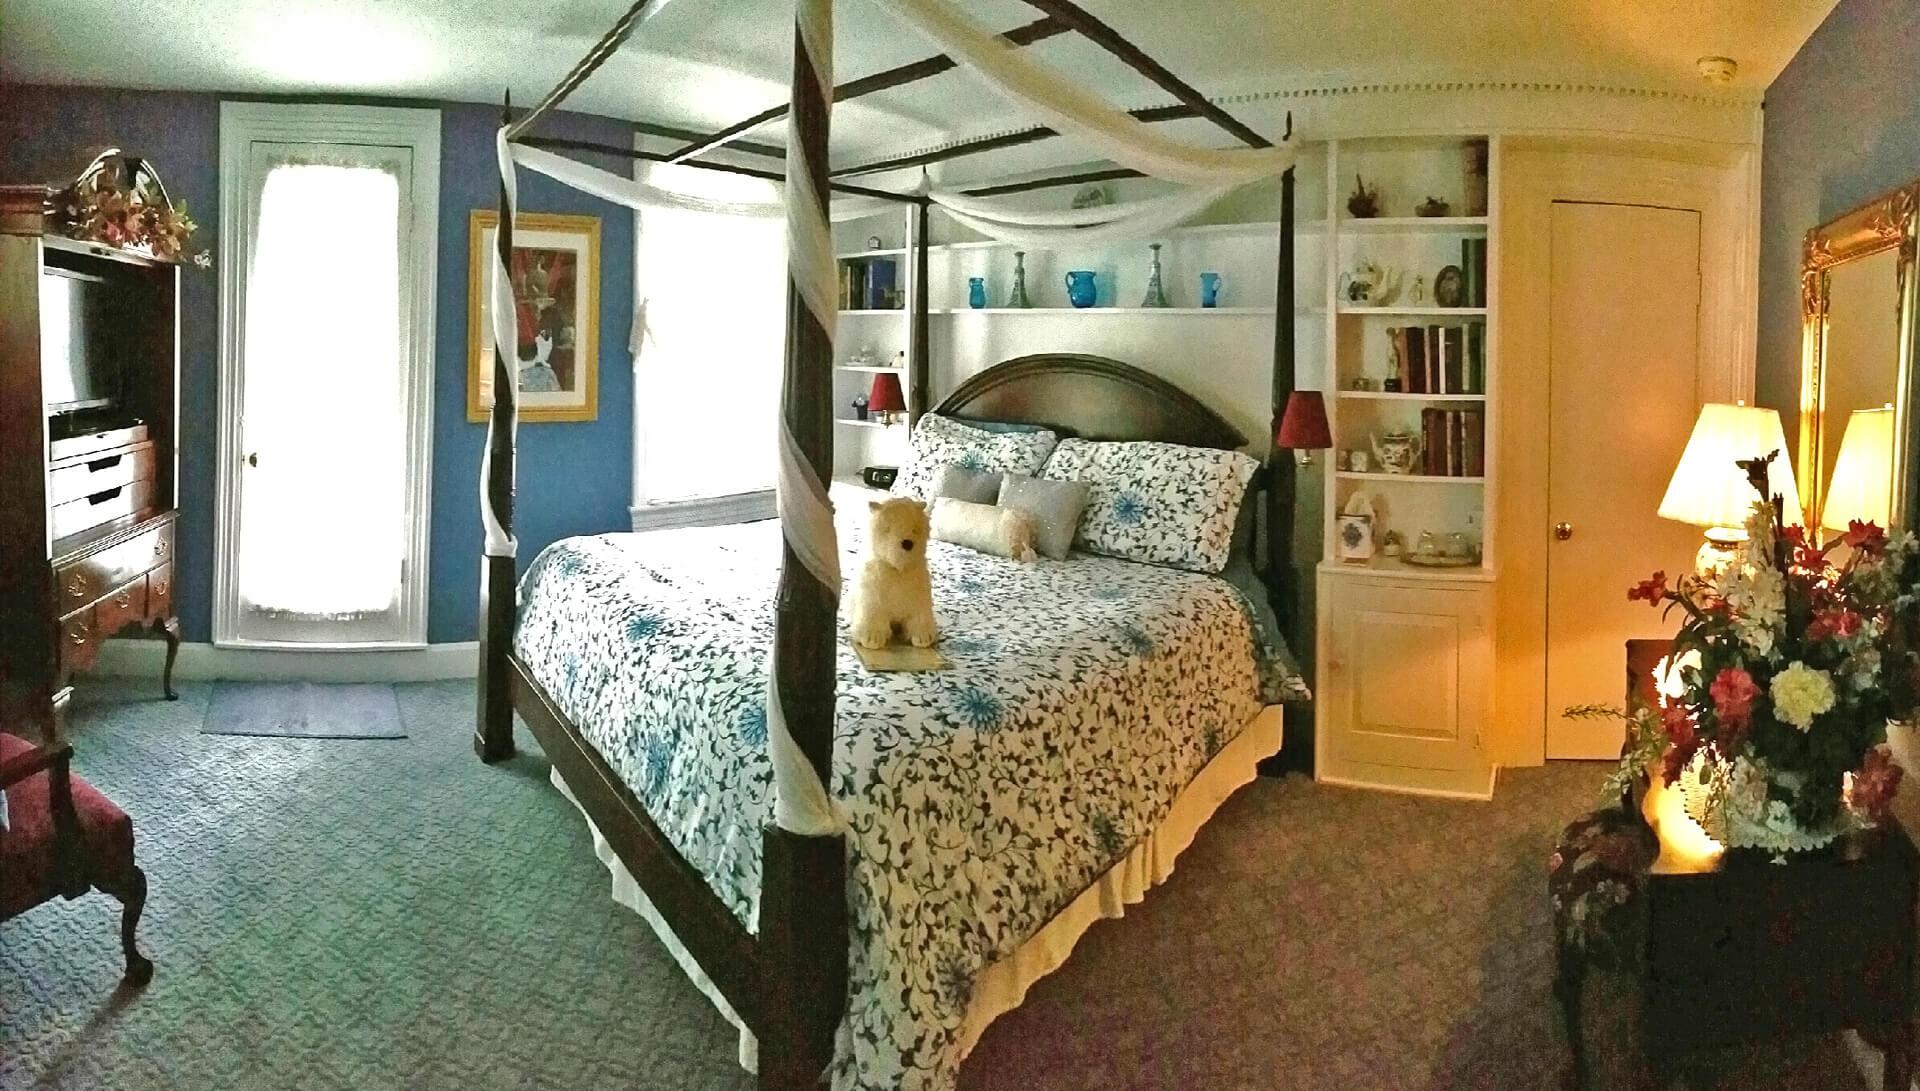 Randall Room